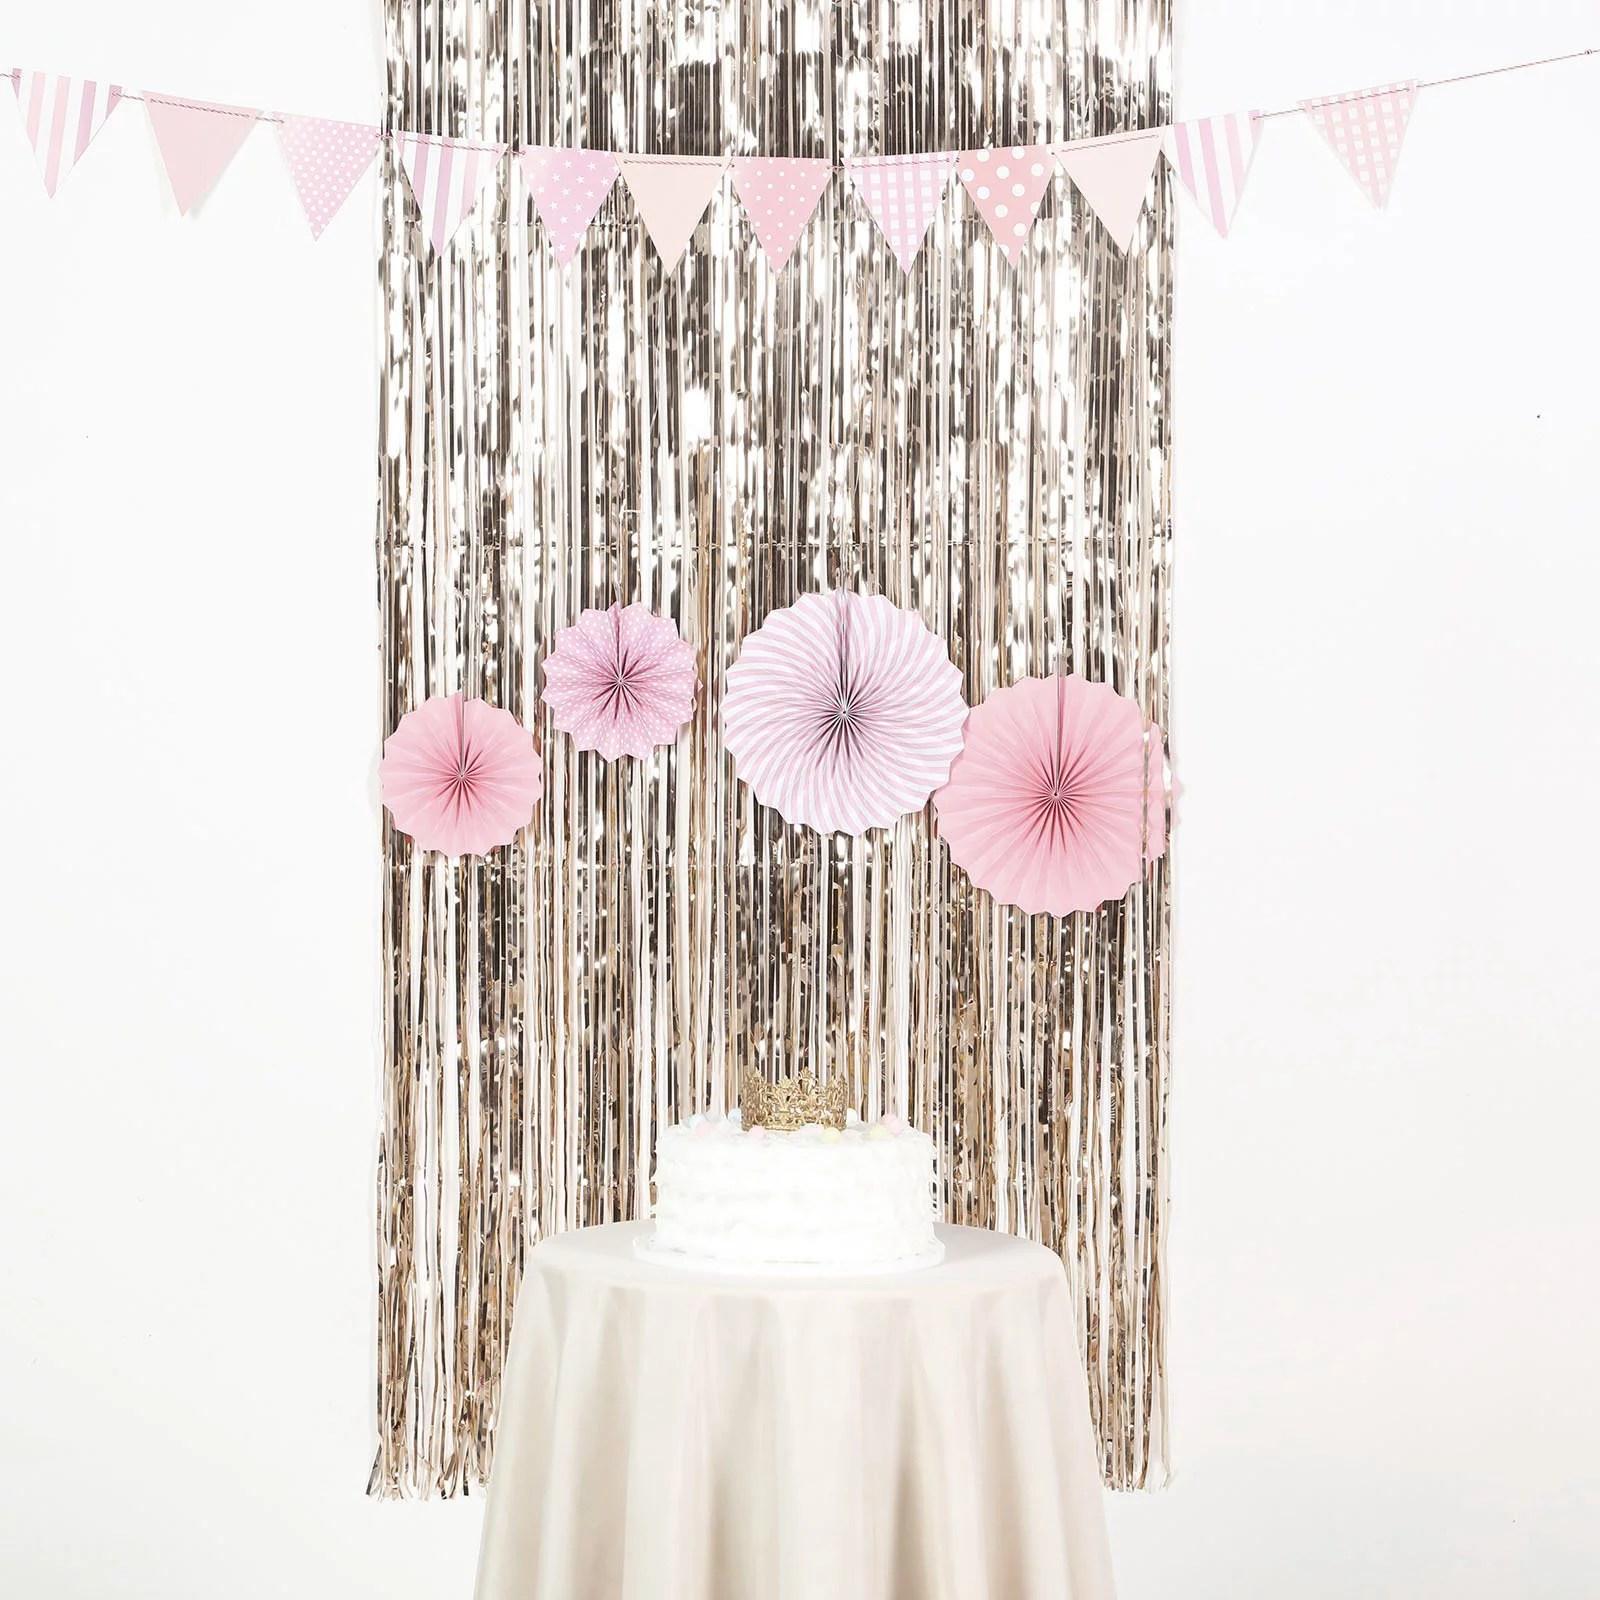 efavormart sparkling metallic foil fringe curtain for wedding birthday party dance banquet event decoration 3ft x 8ft walmart com